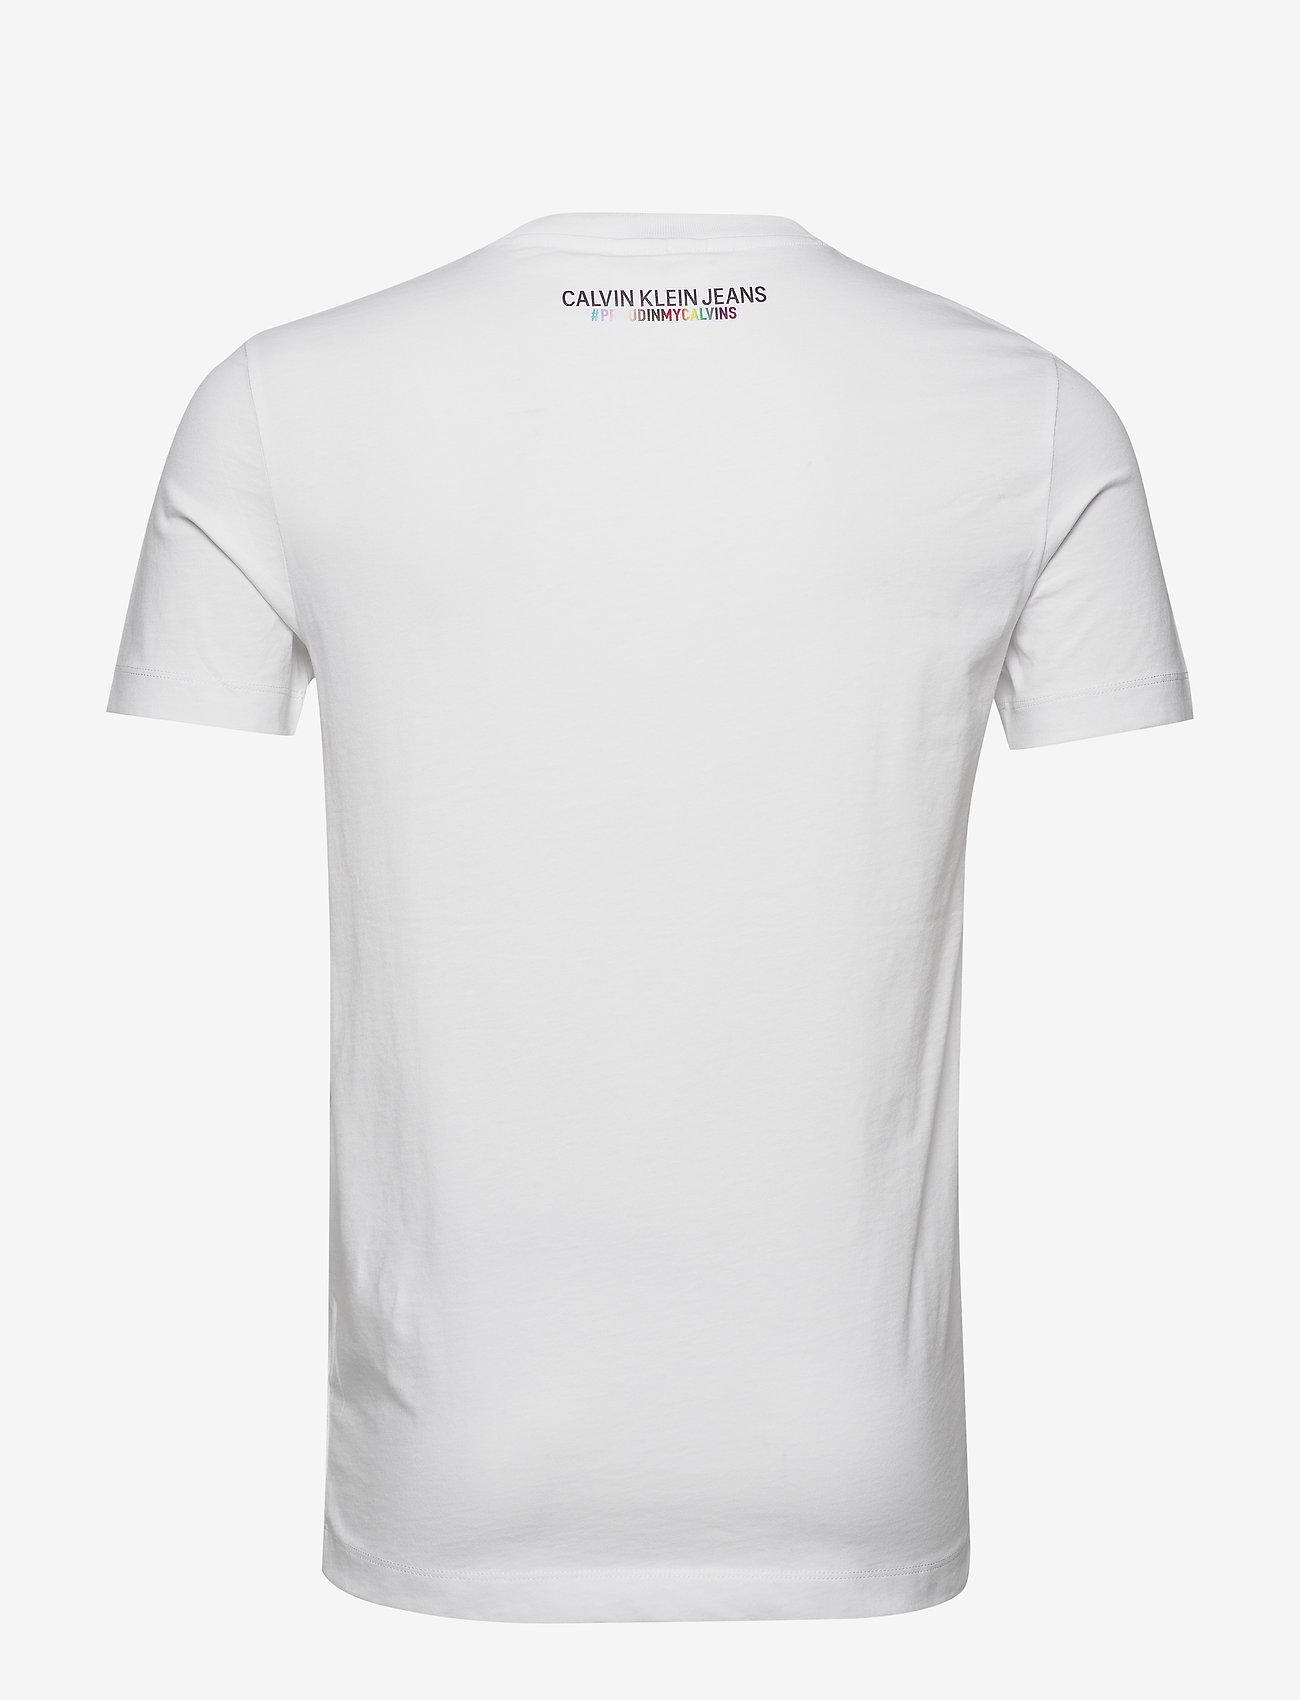 Large Flag Sli (Bright White) - Calvin Klein Jeans XxTLcq